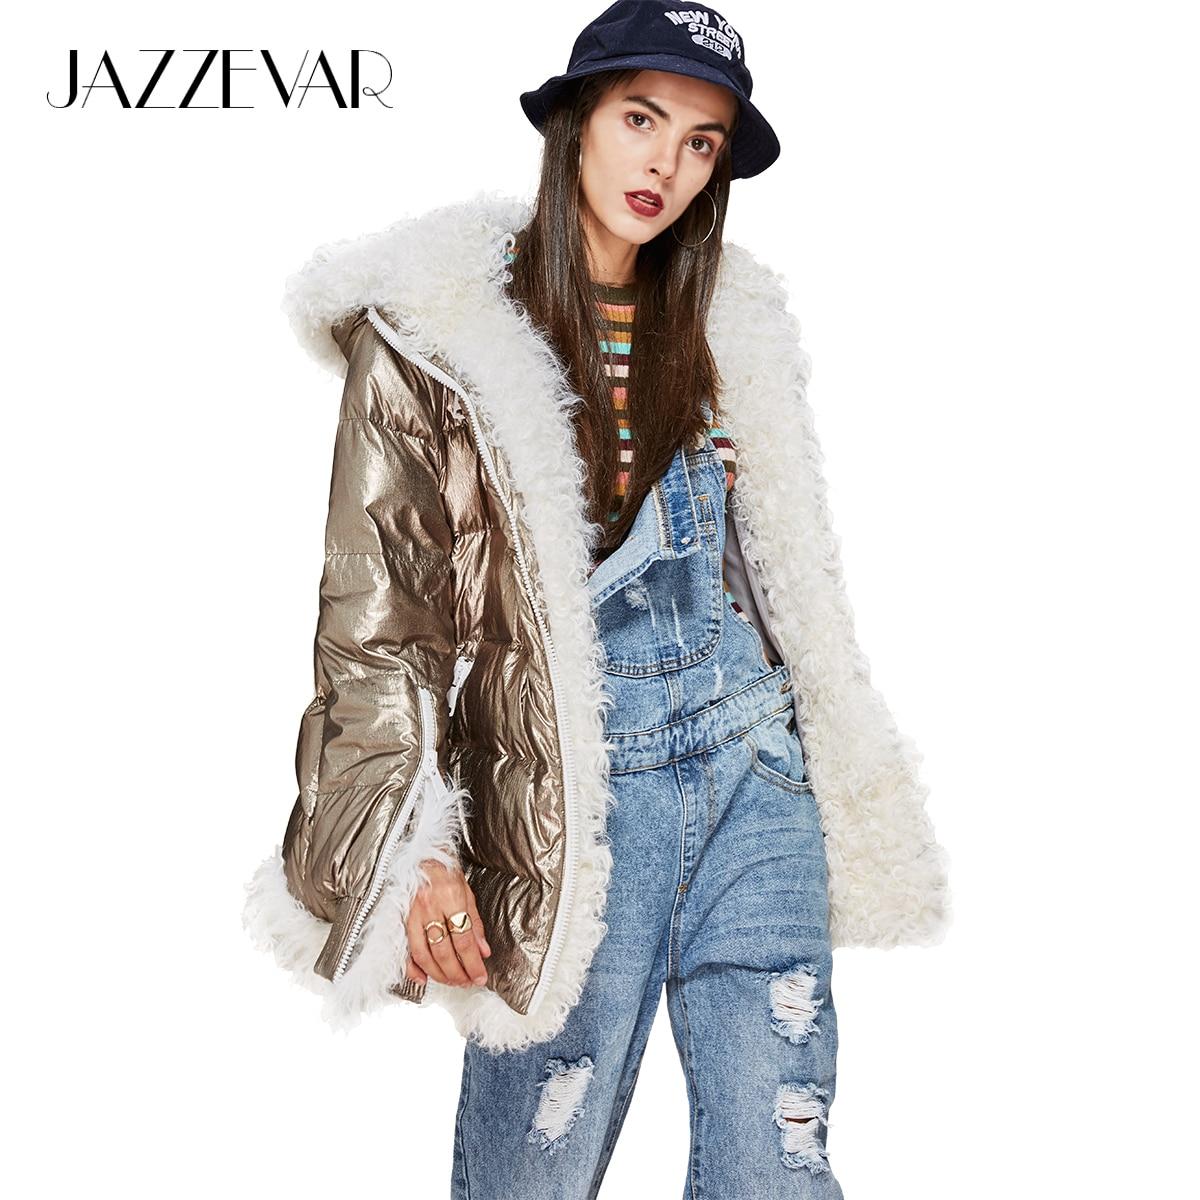 JAZZEVAR Futuristic Designs Edgy Silver Jacket J66754